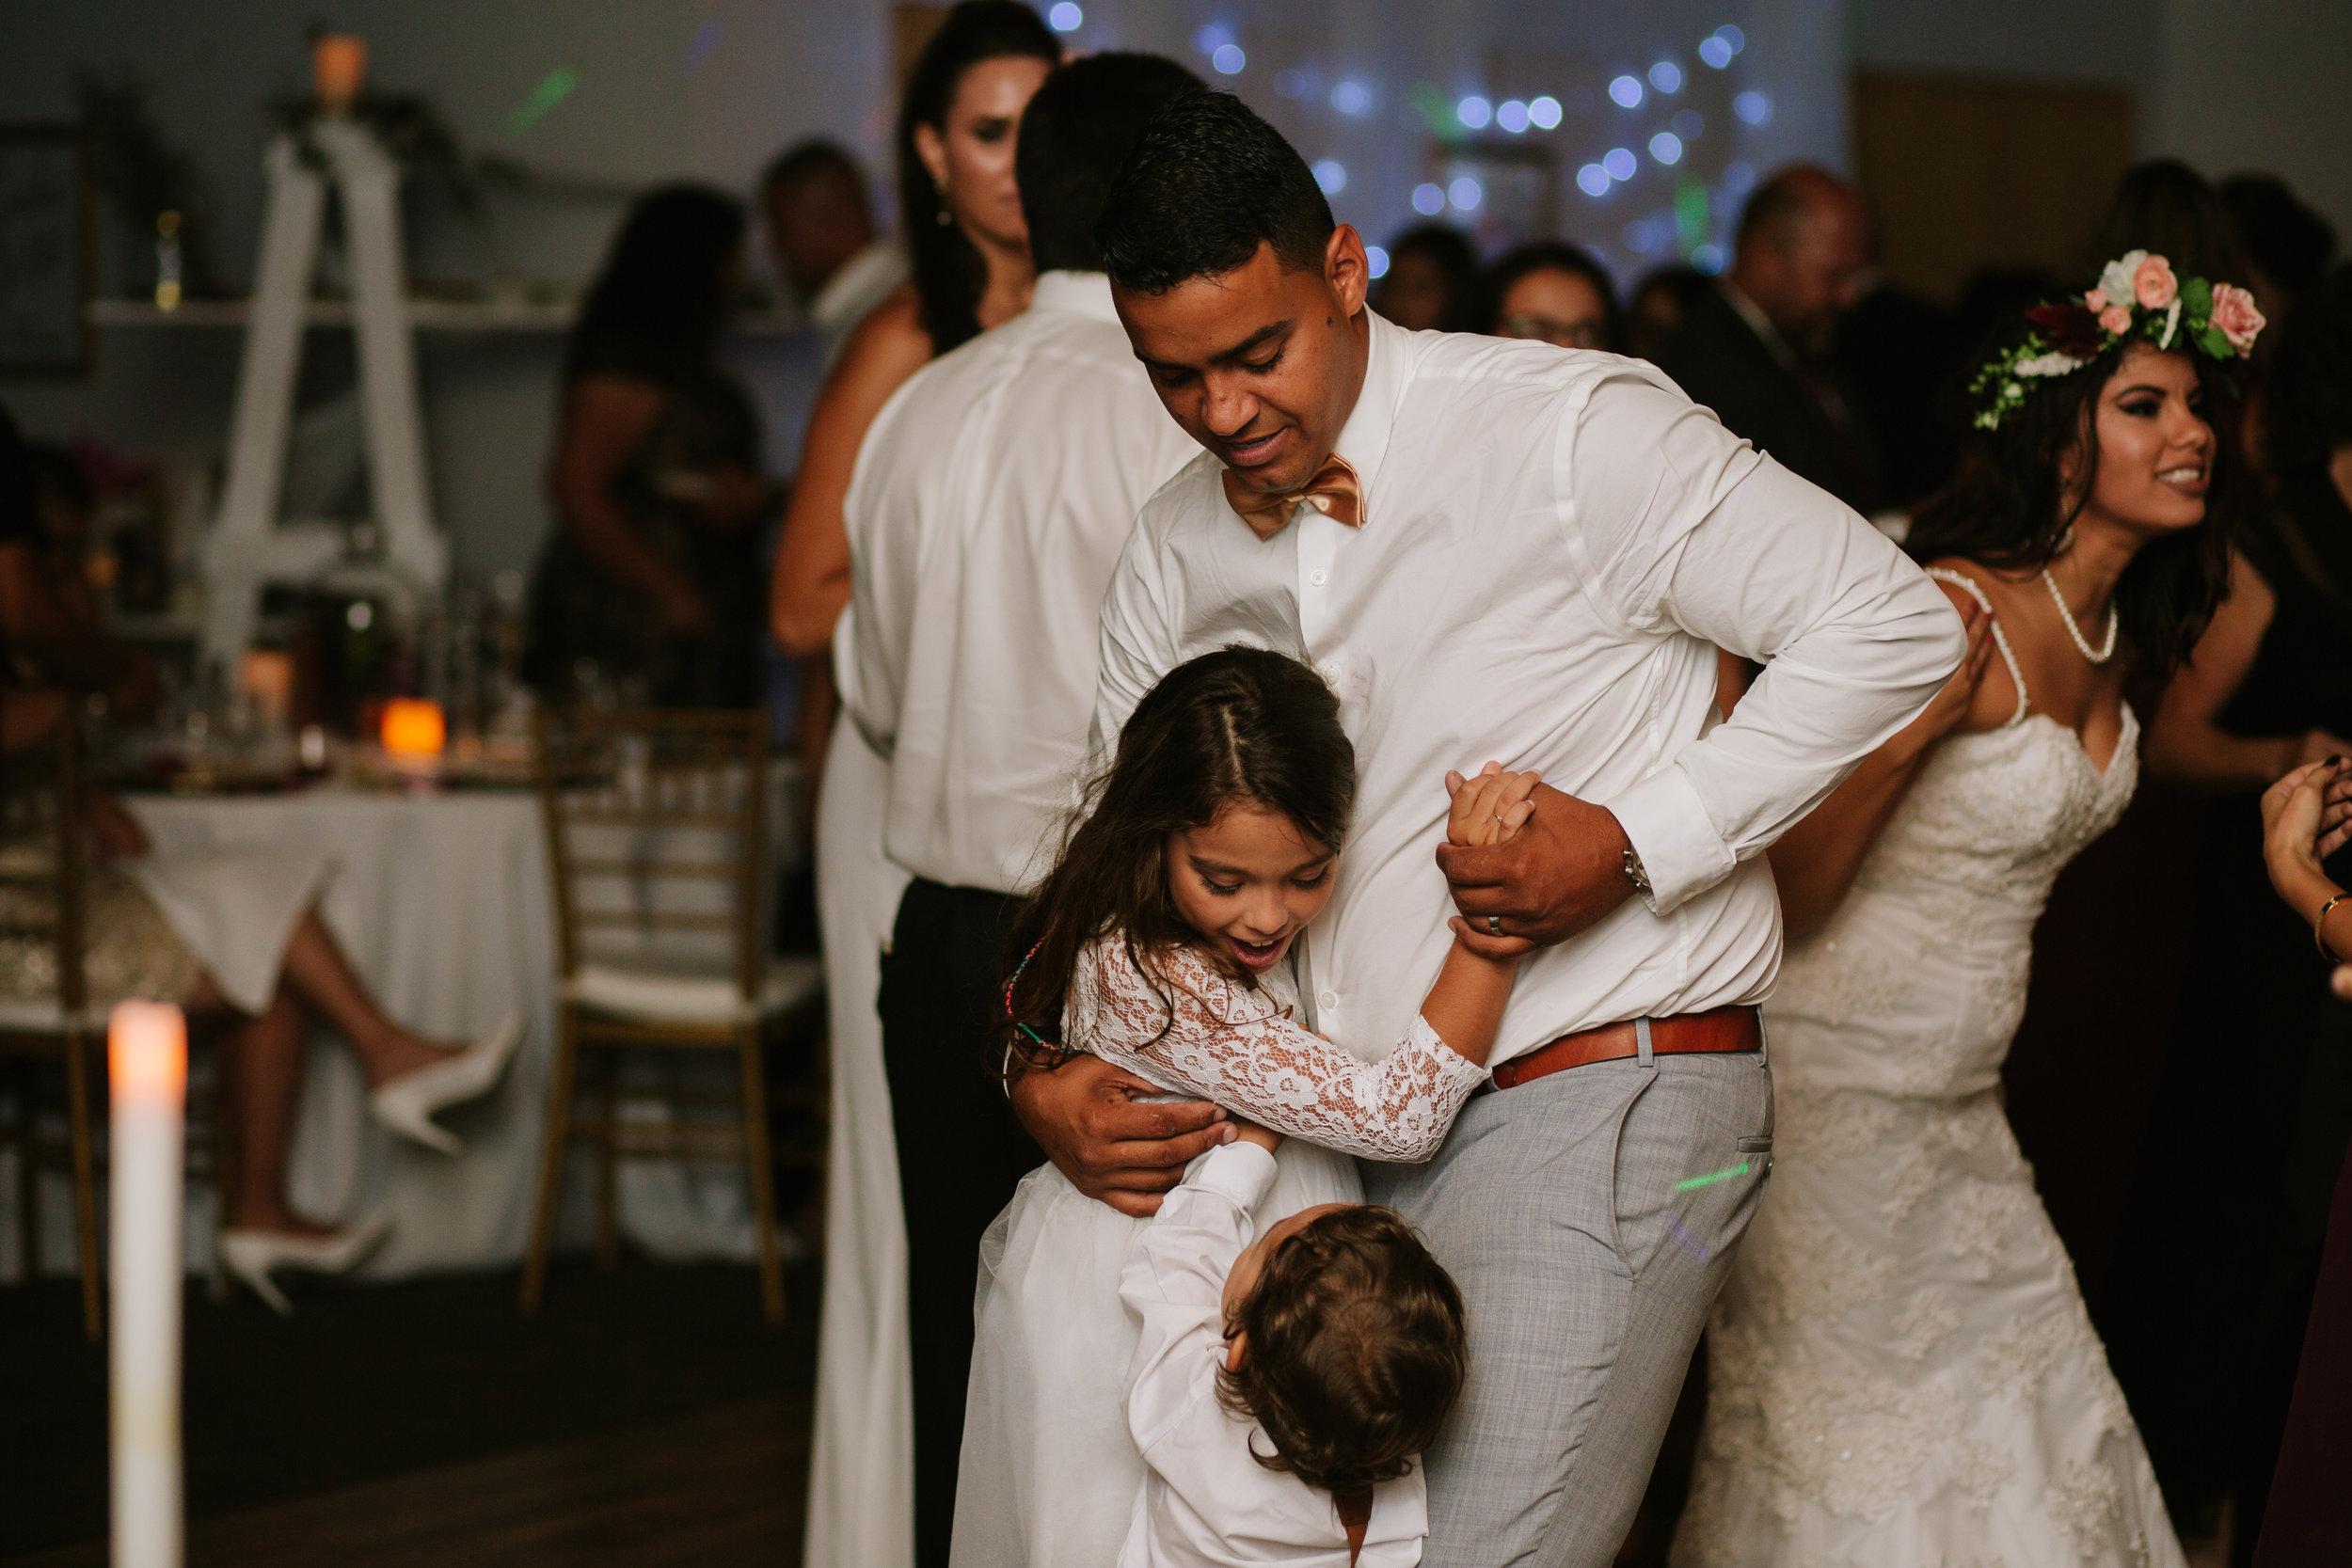 2017.05.23 Barbara and Mauricio Sales Port St Lucie Wedding (709 of 772).jpg